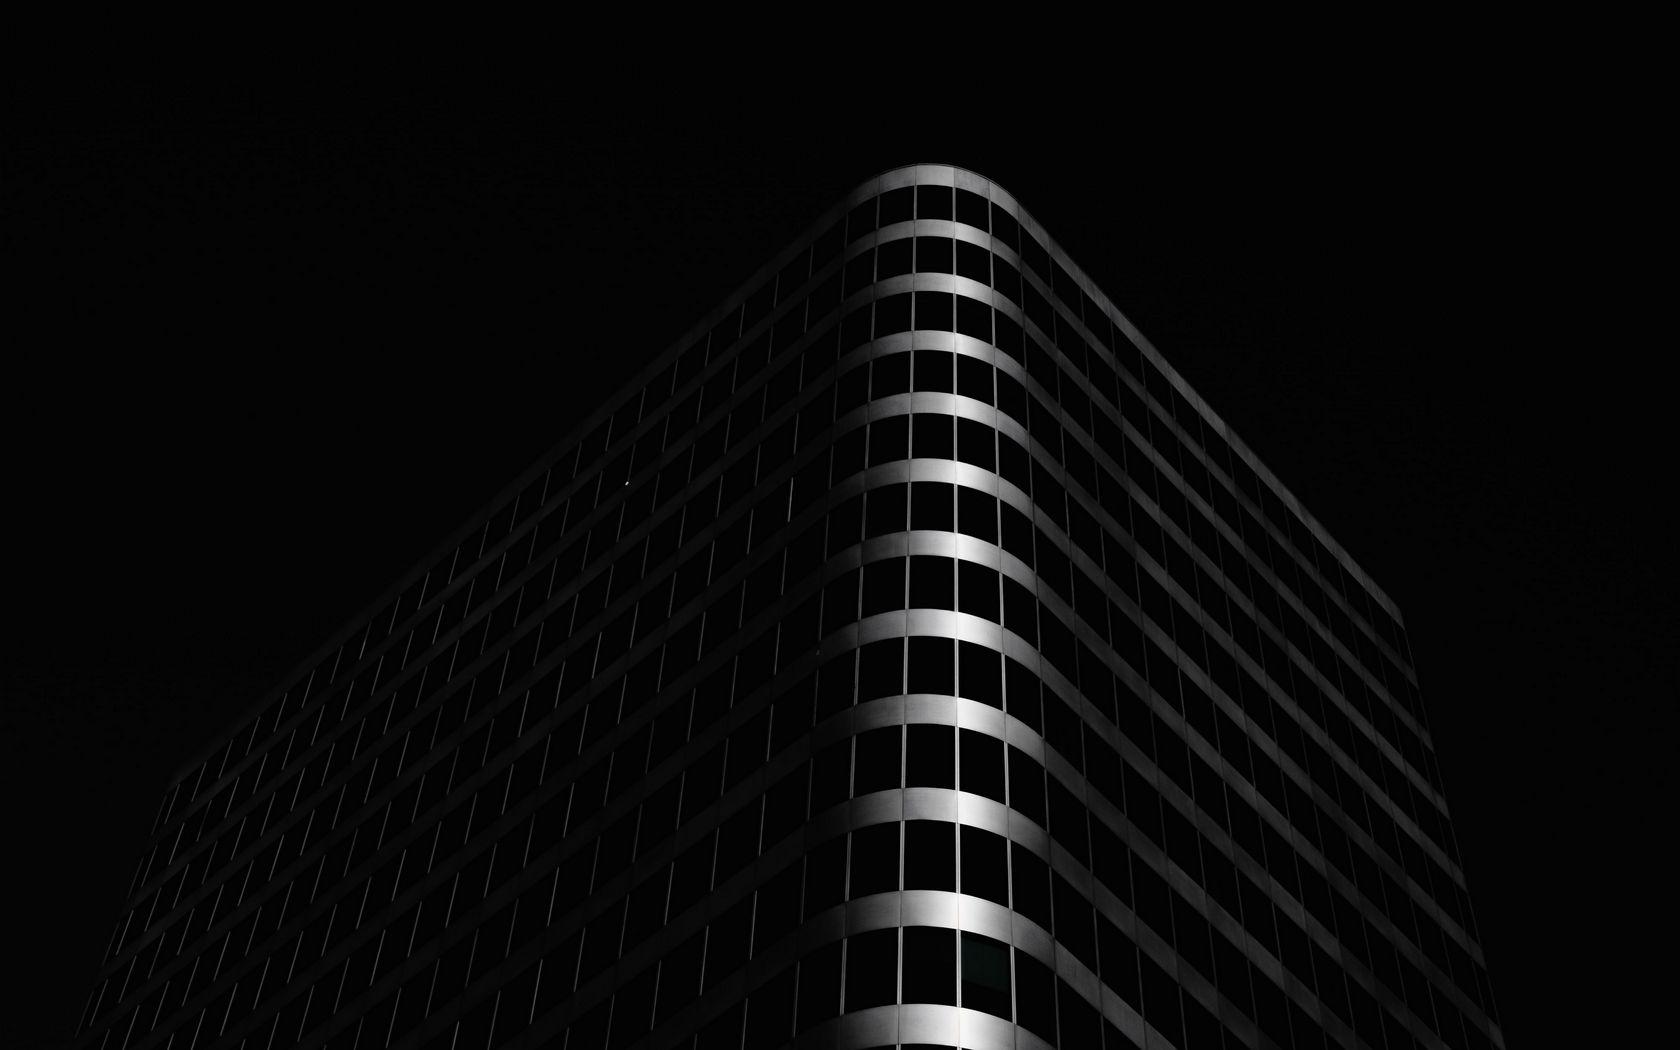 1680x1050 Wallpaper building, architecture, black, dark